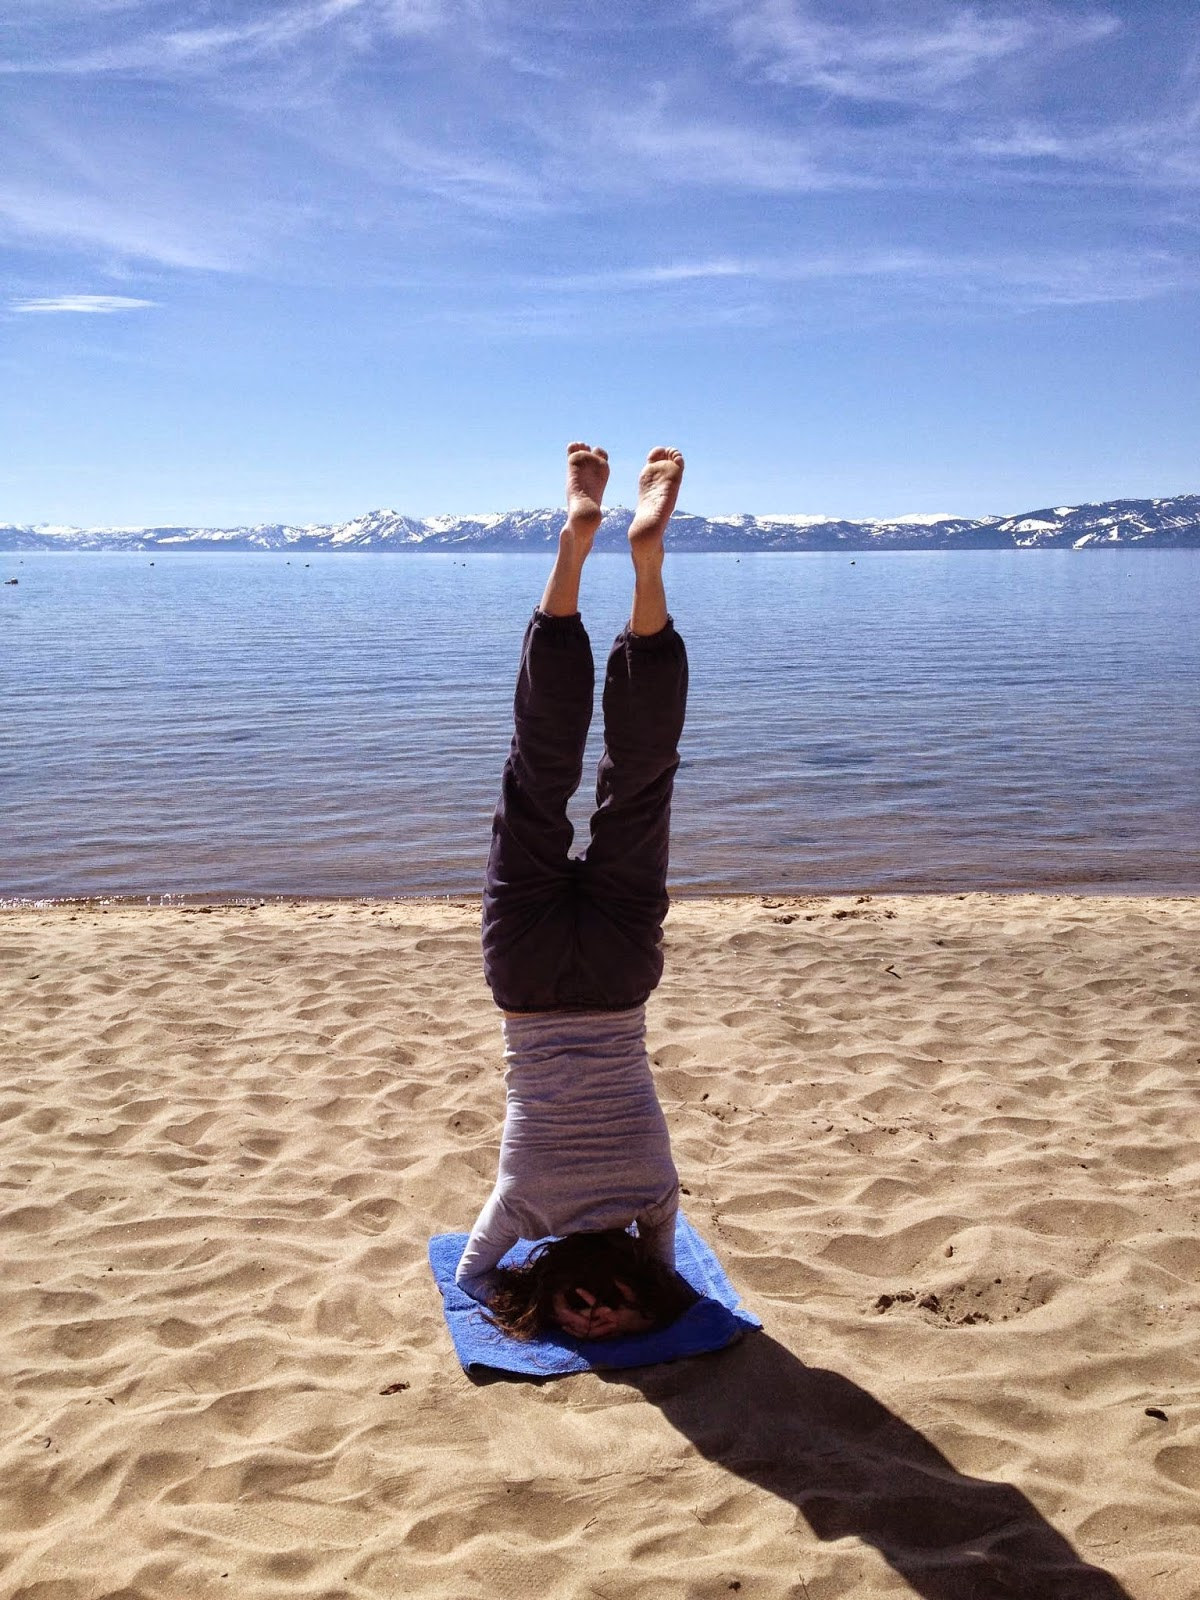 Andrea Elson Fotos andrea elson blog: forearm balance at king's beach, lake tahoe